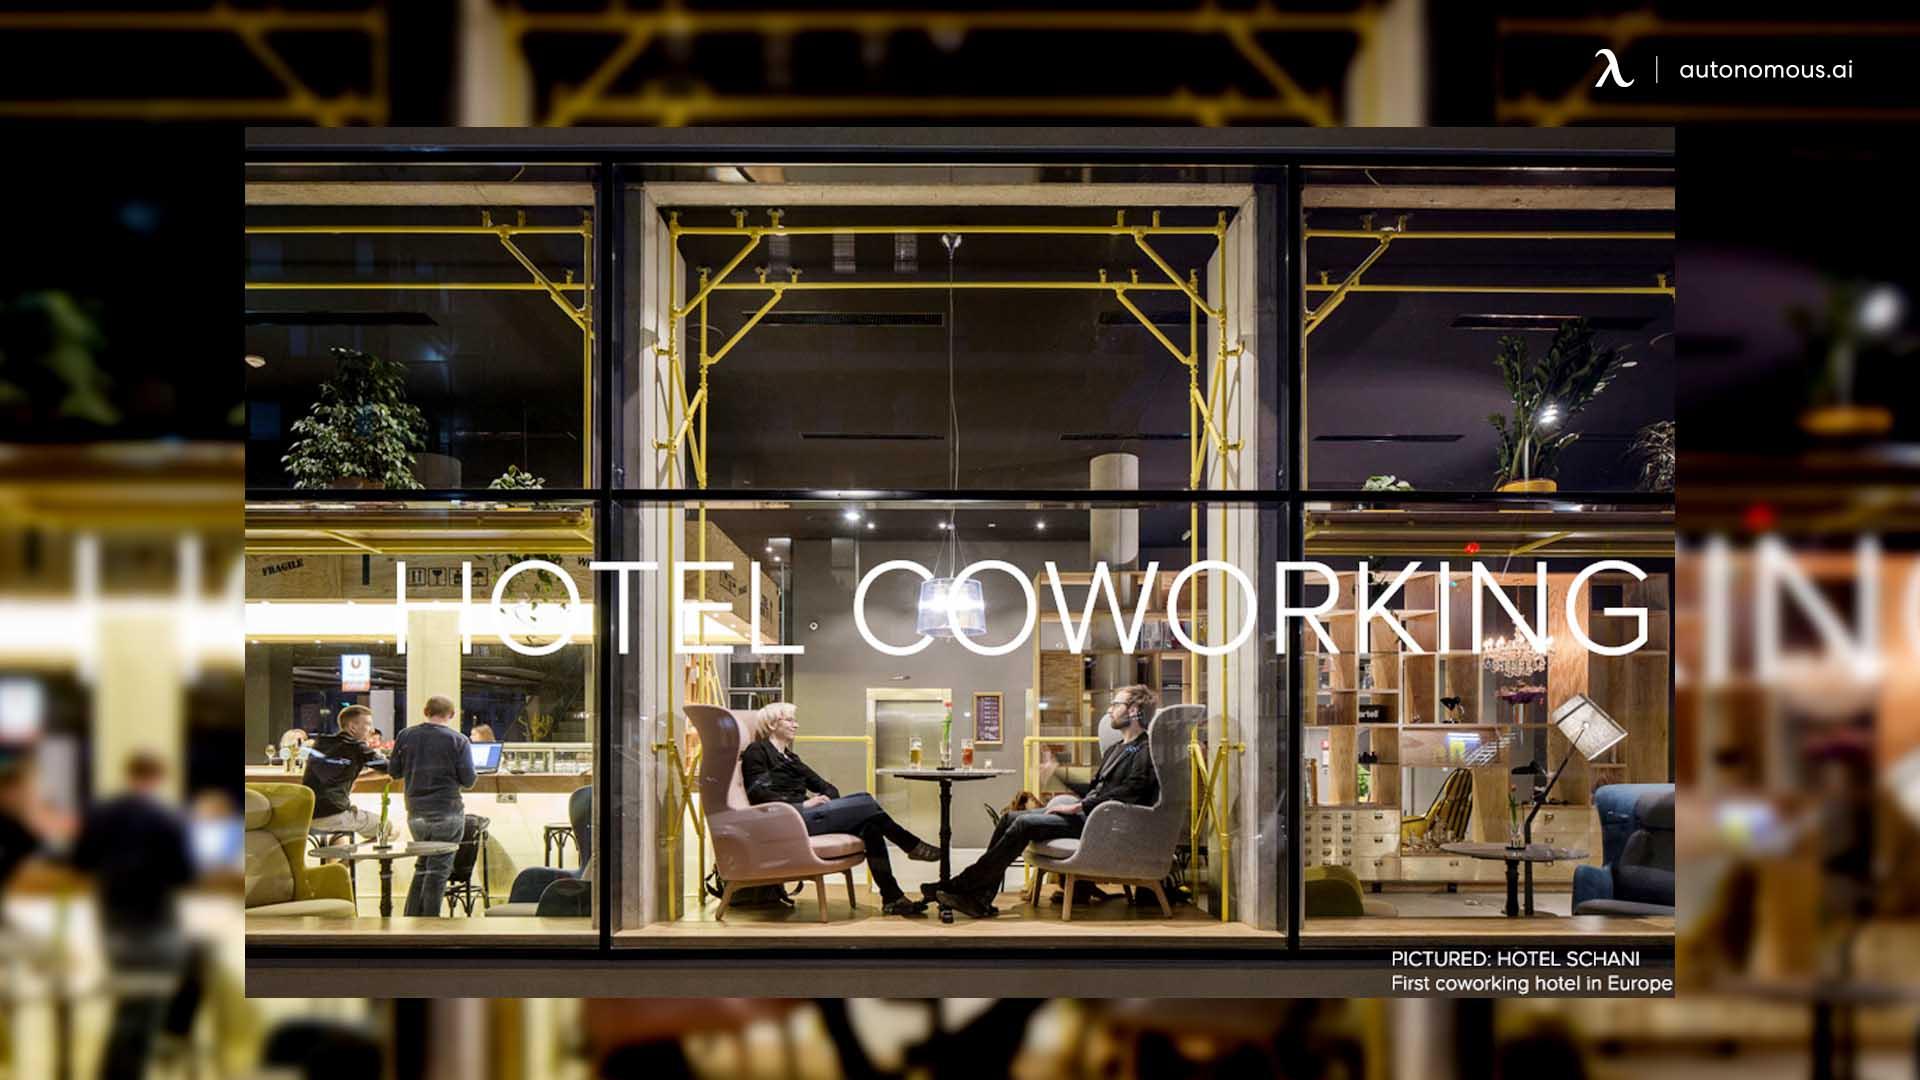 How did coworking begin?